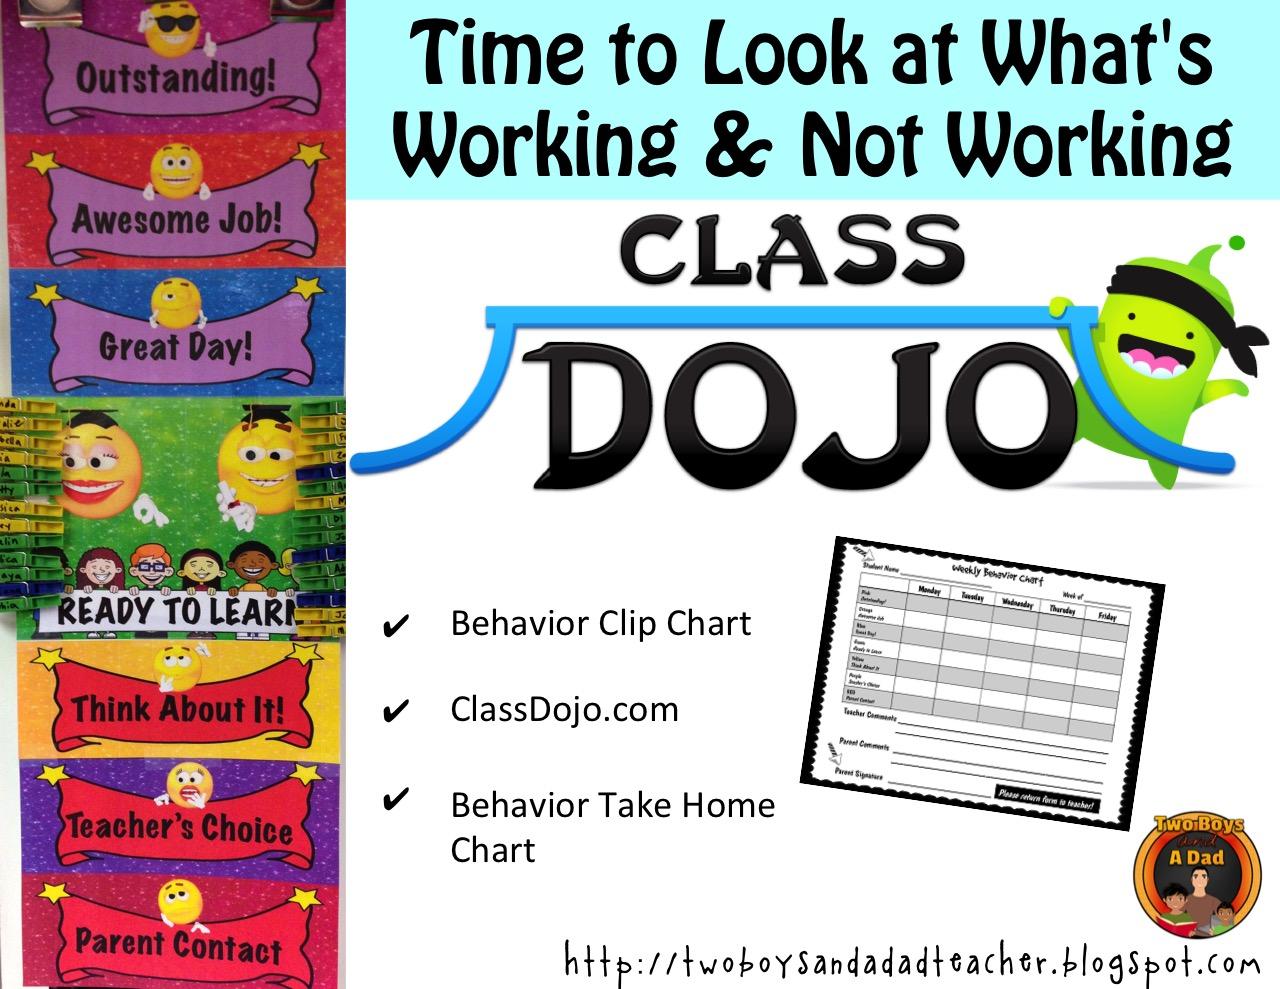 ClassDojo and Behavior Charts